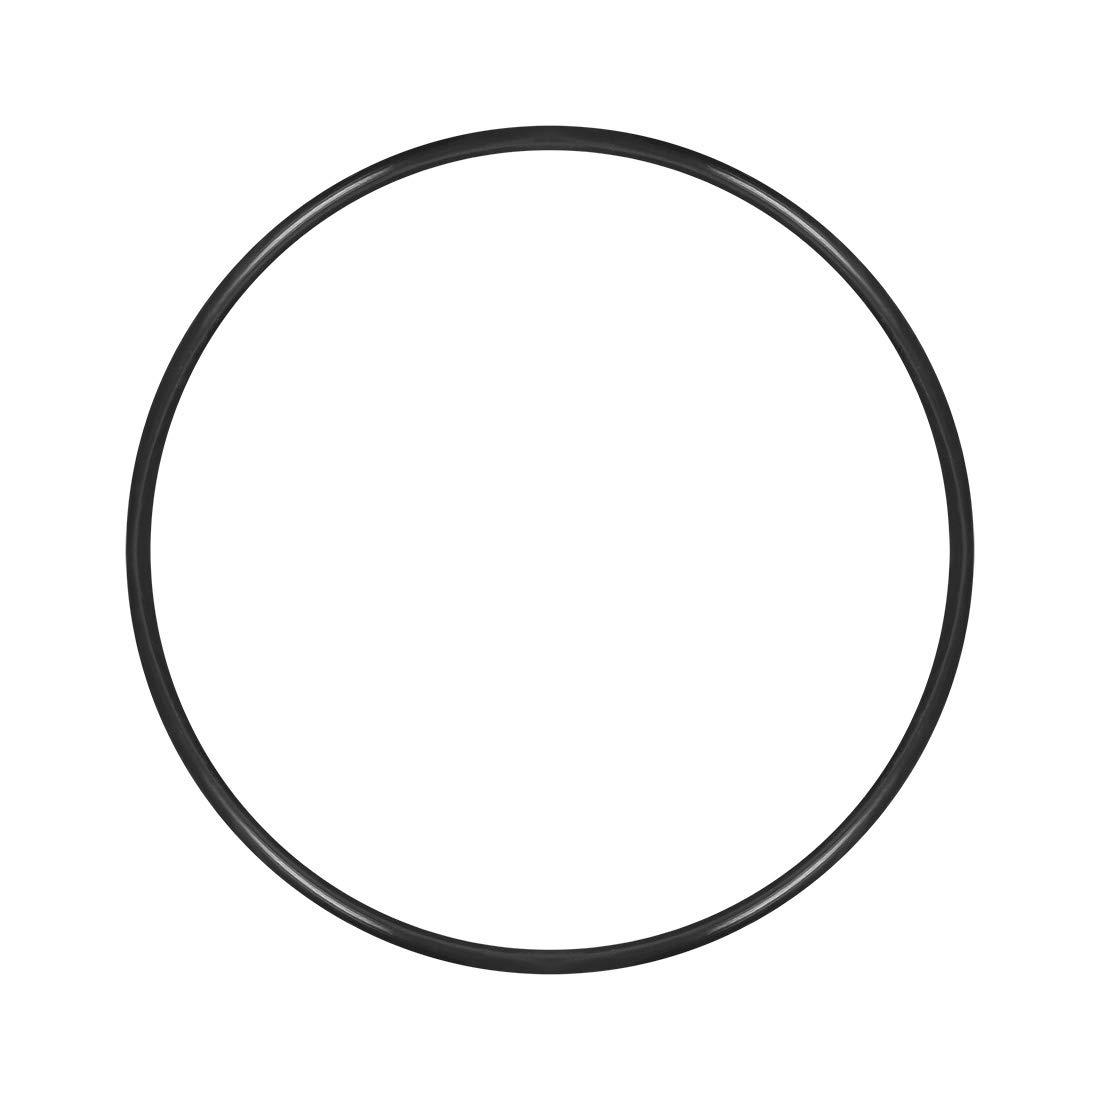 O-Rings Nitrile Rubber 136mm x 141.3mm x 2.65mm Seal Rings Sealing Gasket 1pcs